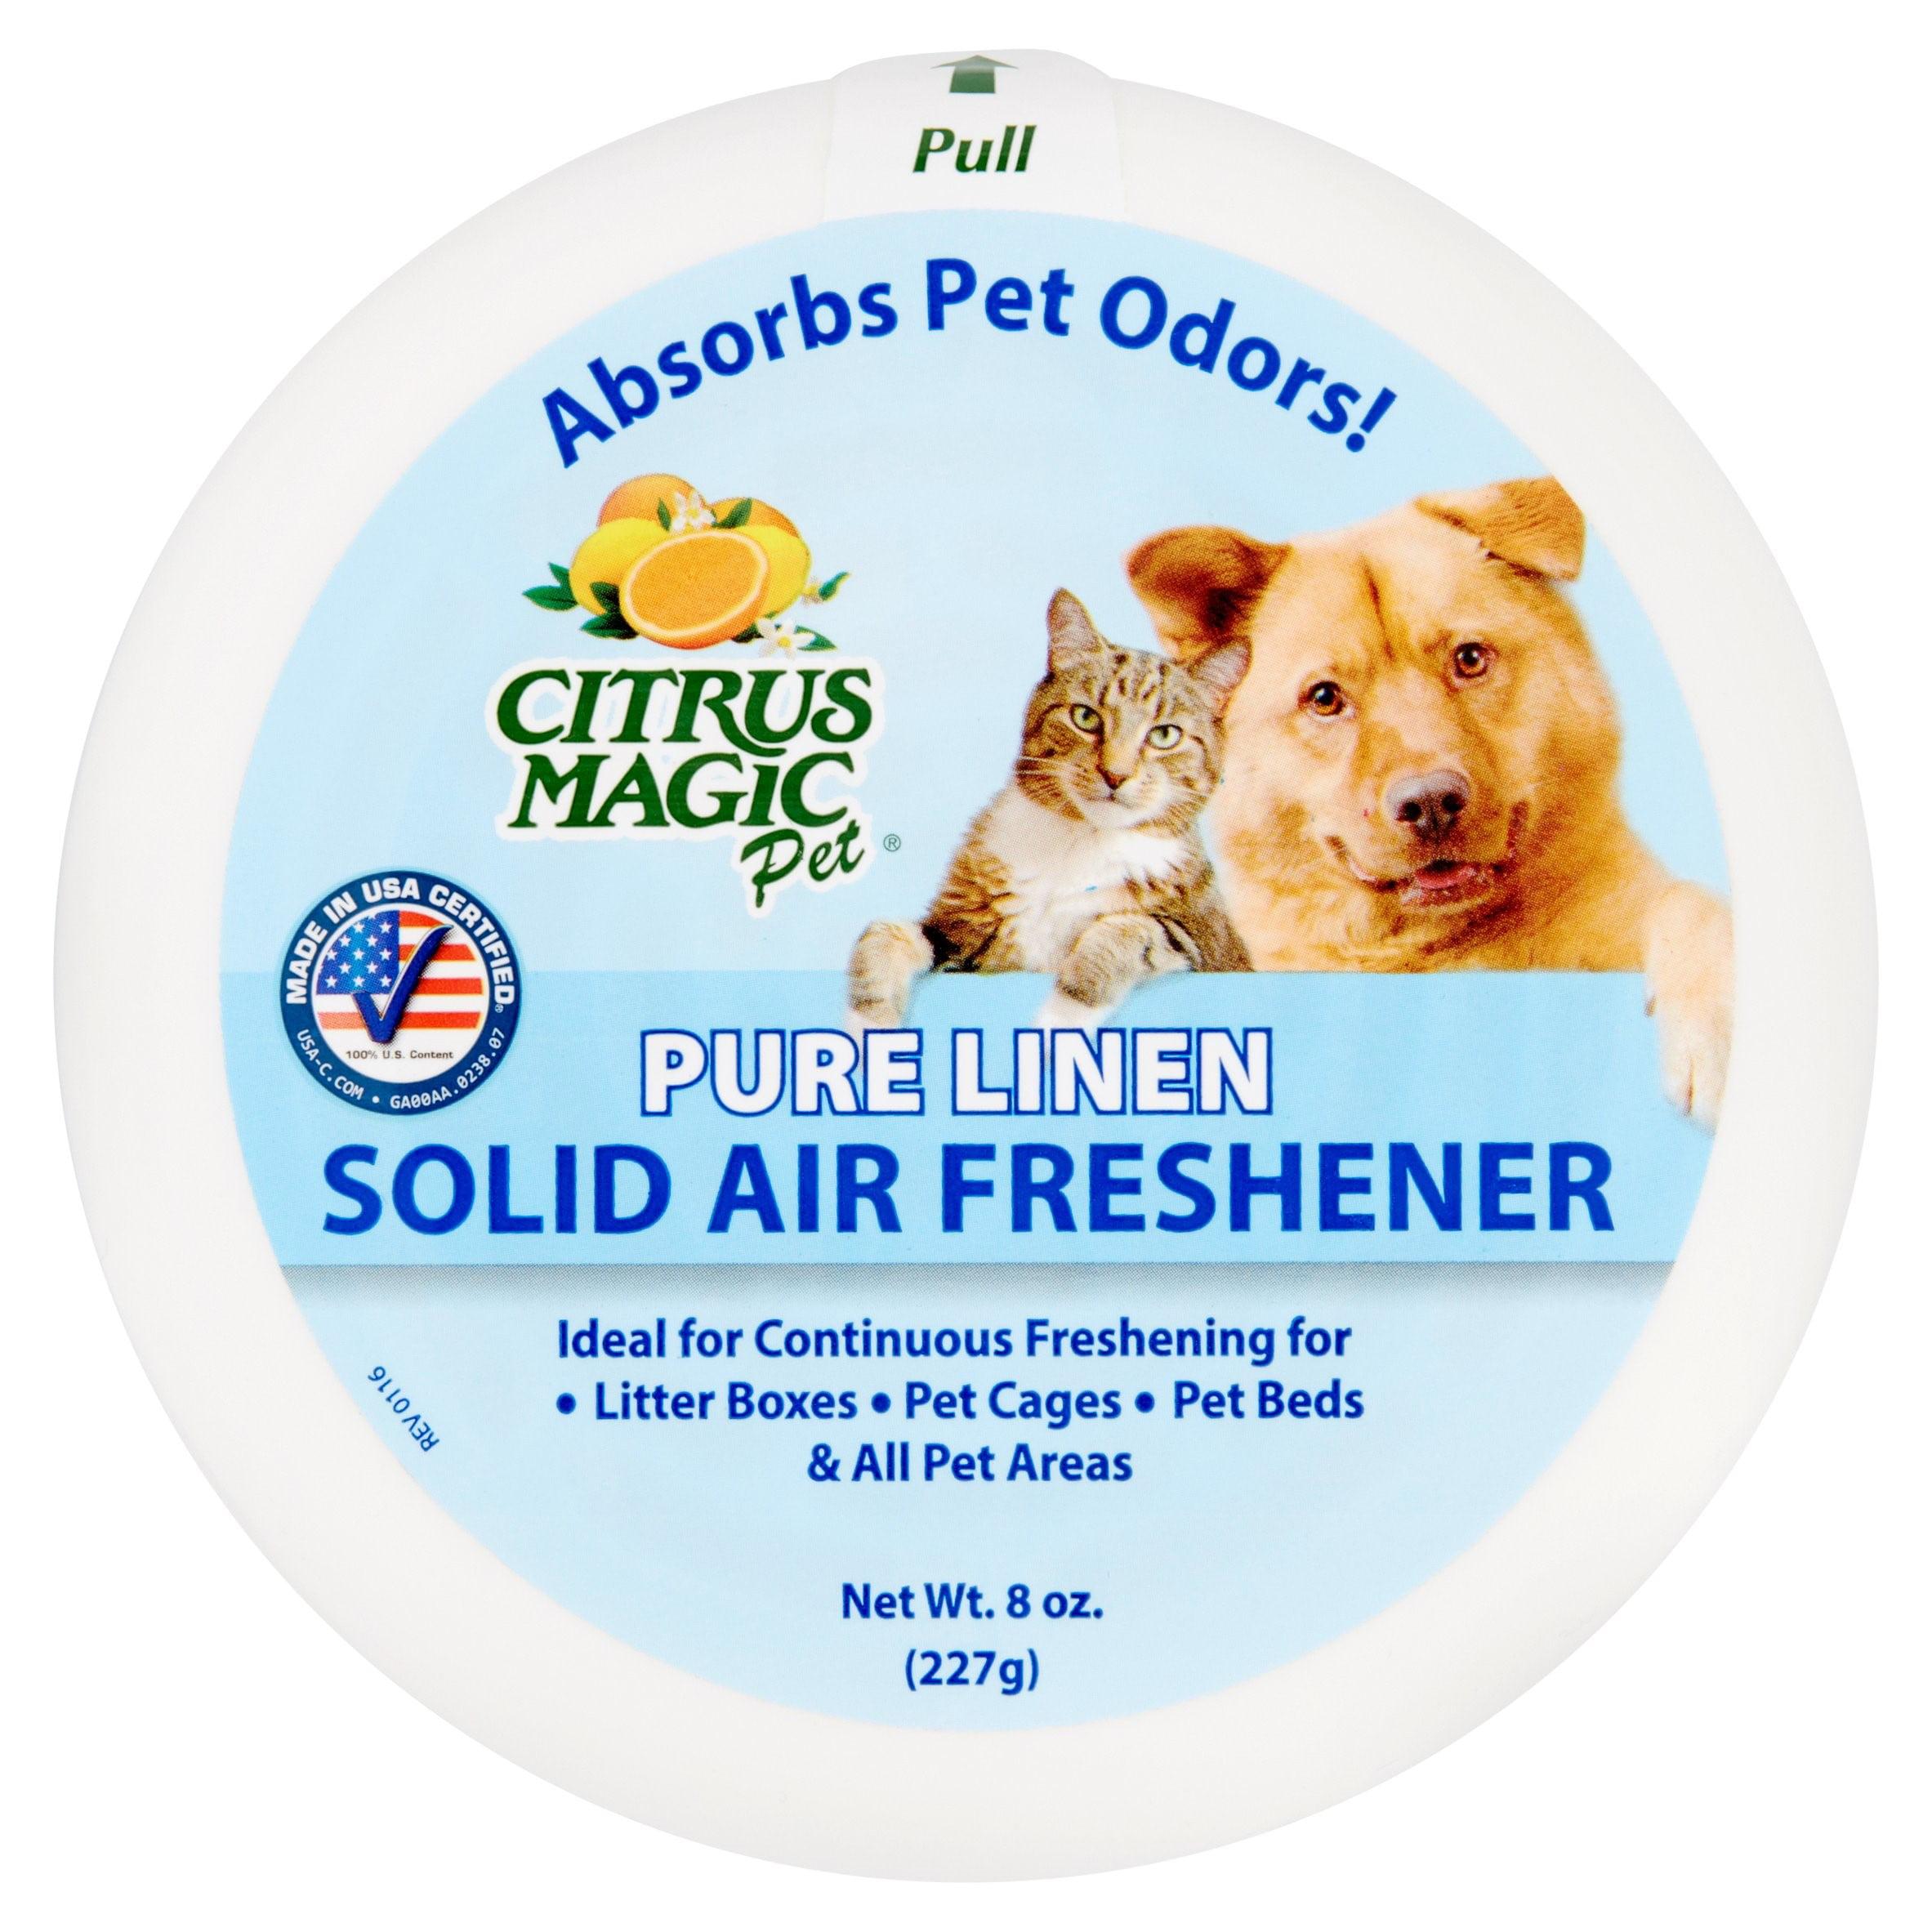 Citrus Magic Pet Odor Absorbing Solid Air Freshener, Pure Linen, 8 oz.